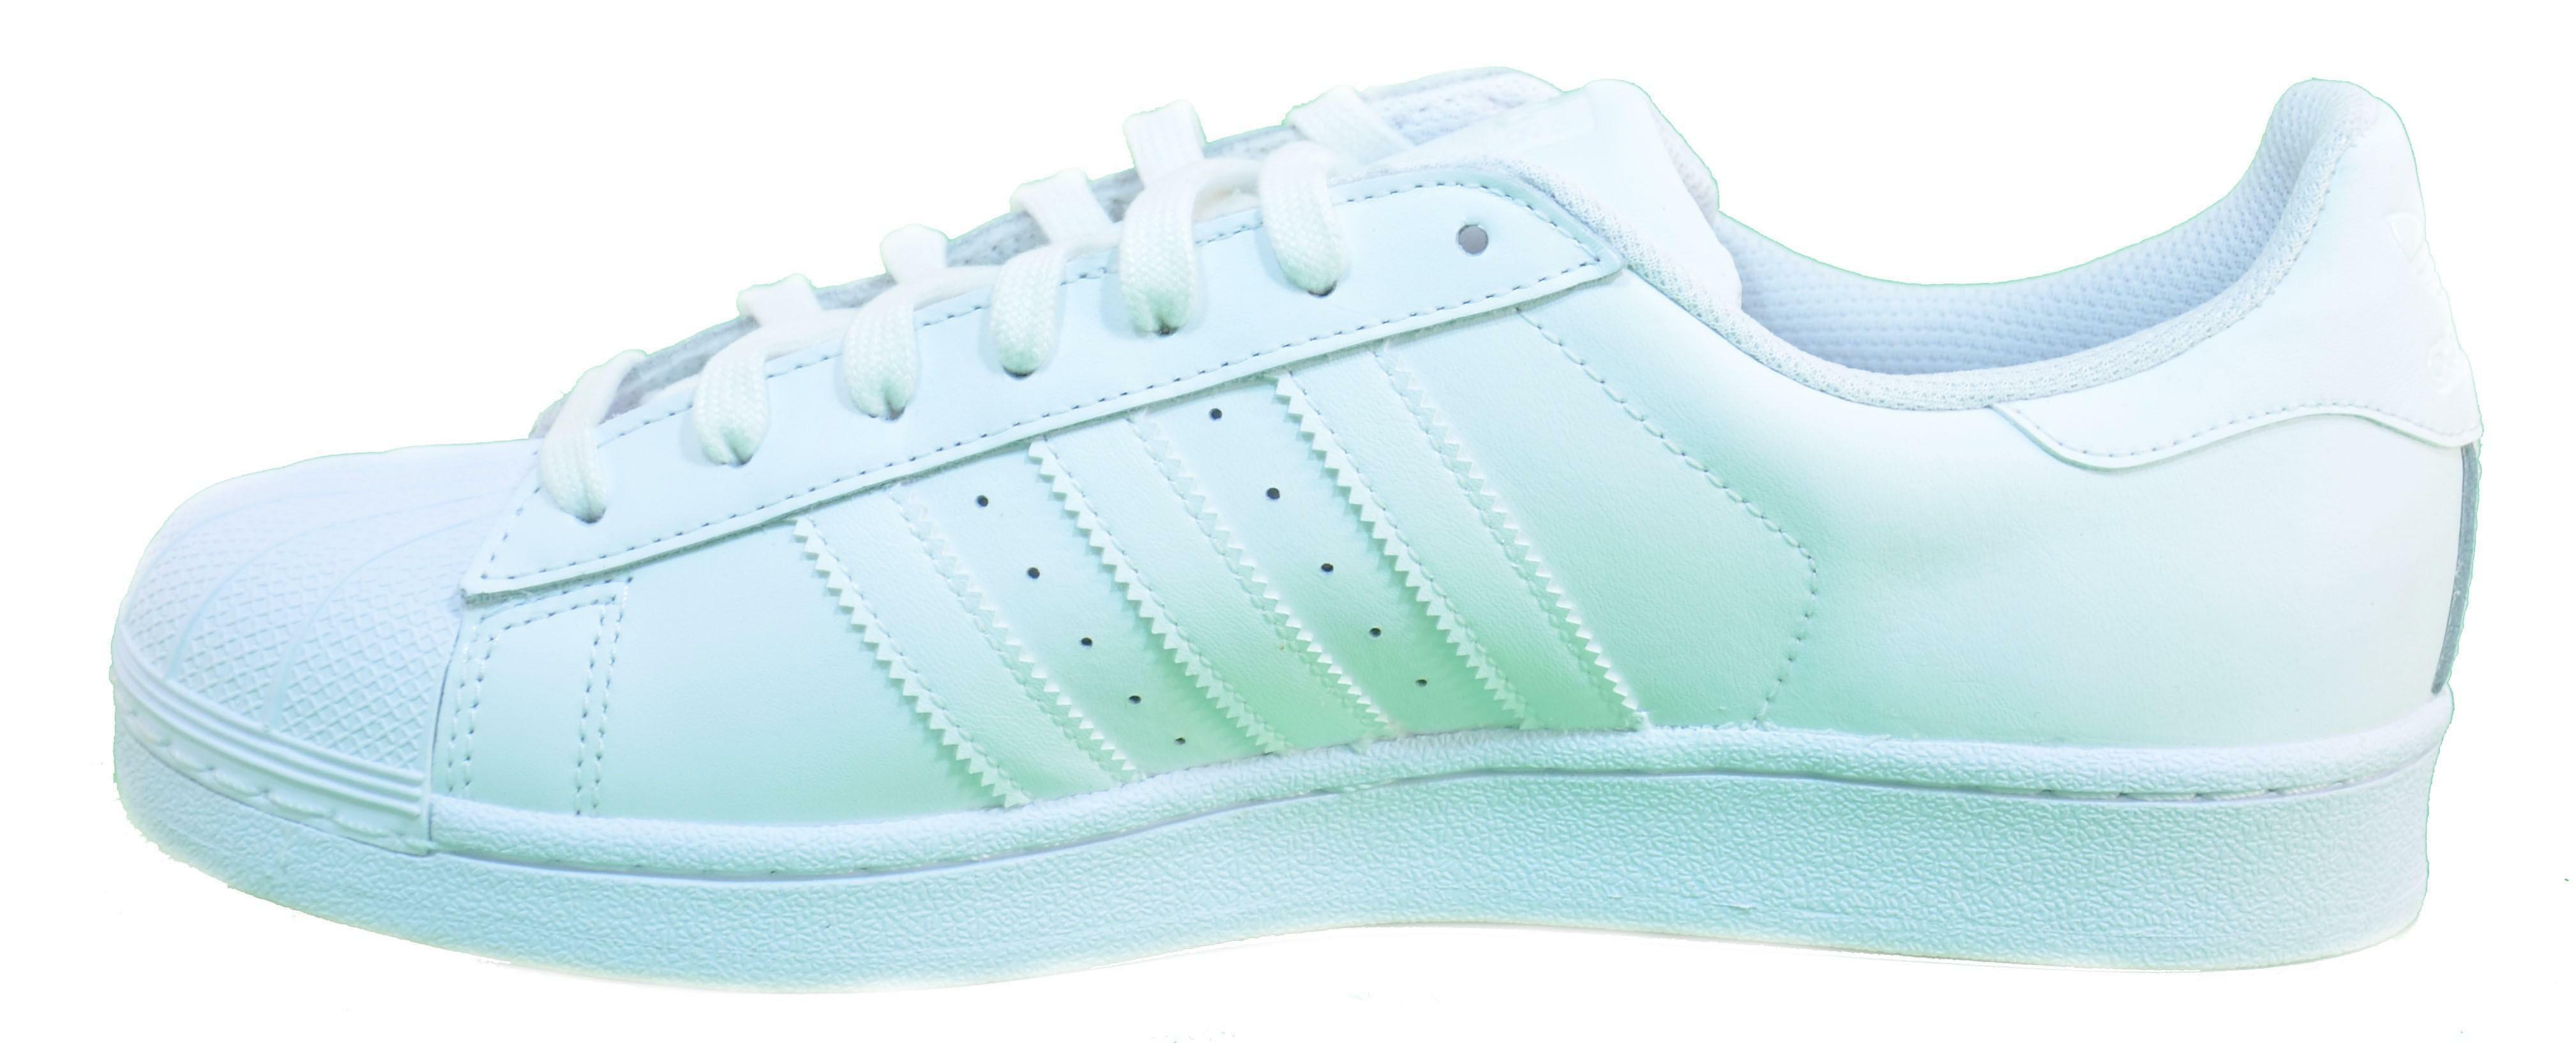 adidas superstar foundation scarpe uomo bianche pelle b27136